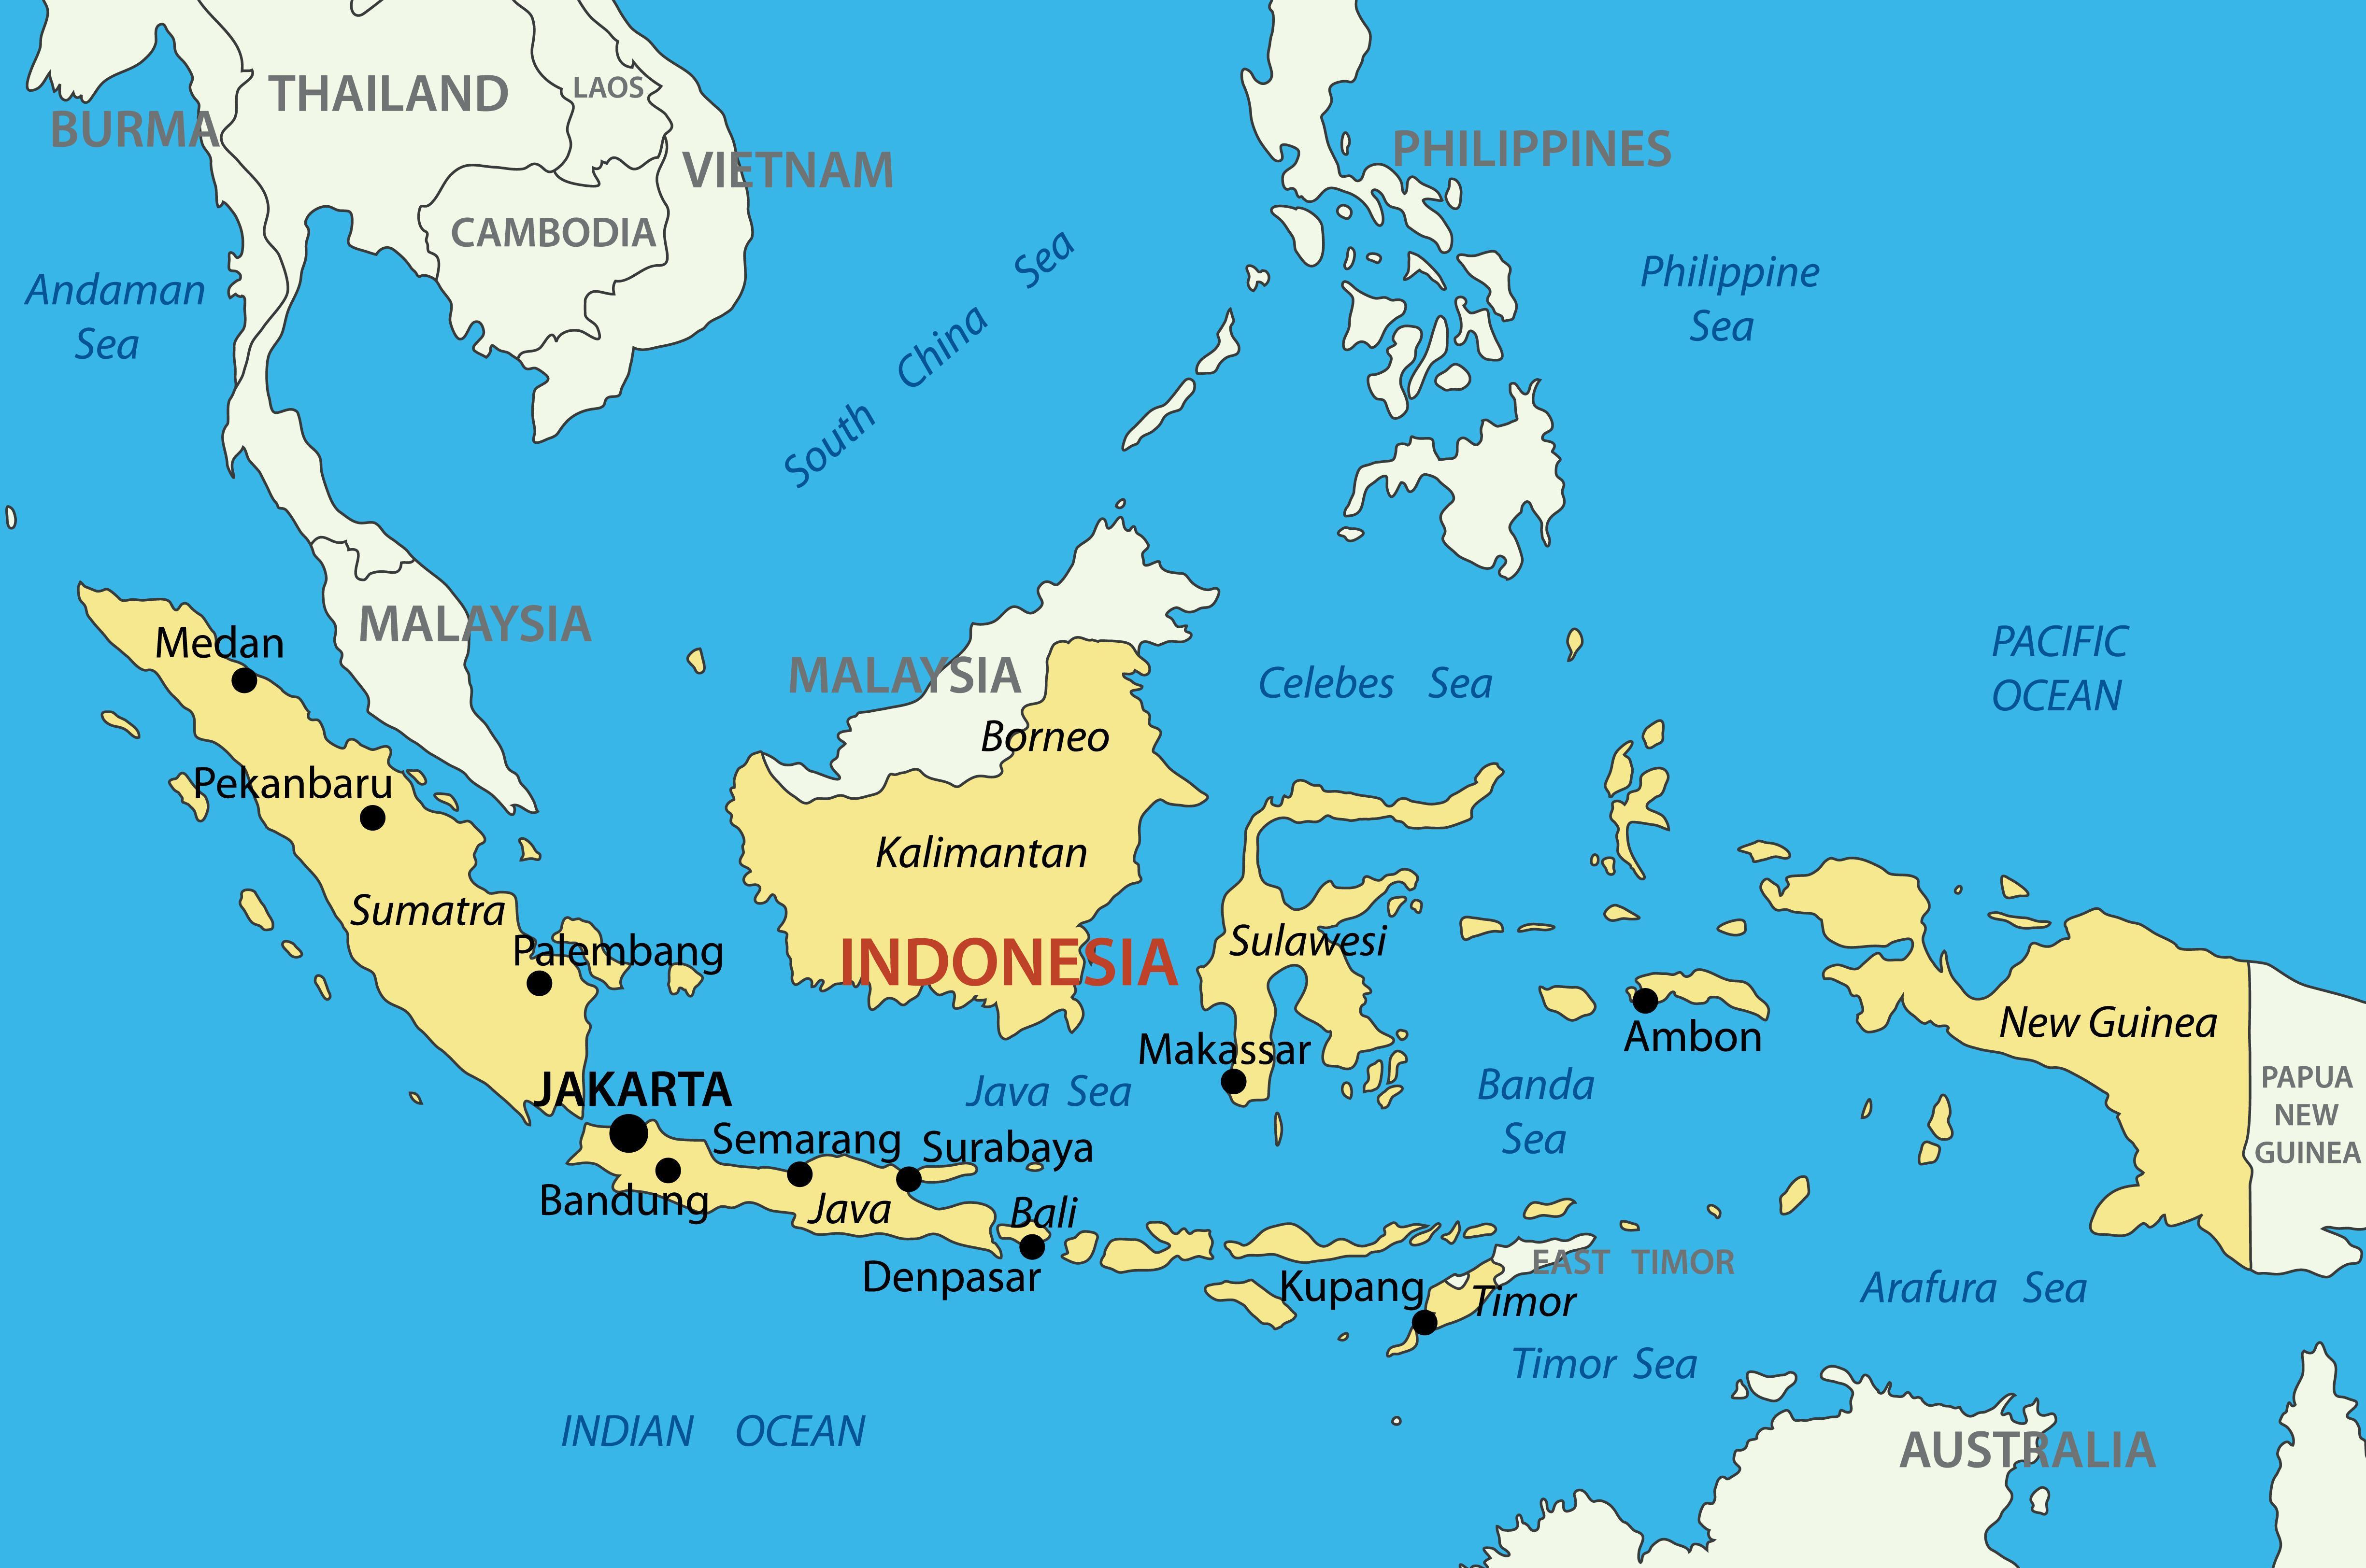 Indonesia Map - Reach to Teach on arabia map, far east map, nigeria map, drc map, europe map, bali map, new zealand, papua new guinea map, israel map, irian jaya map, south korea, japan map, tunisia map, sumatra map, china map, the balkans map, mexico map, poland map, asia map, haiti map, latin america map, sri lanka map,